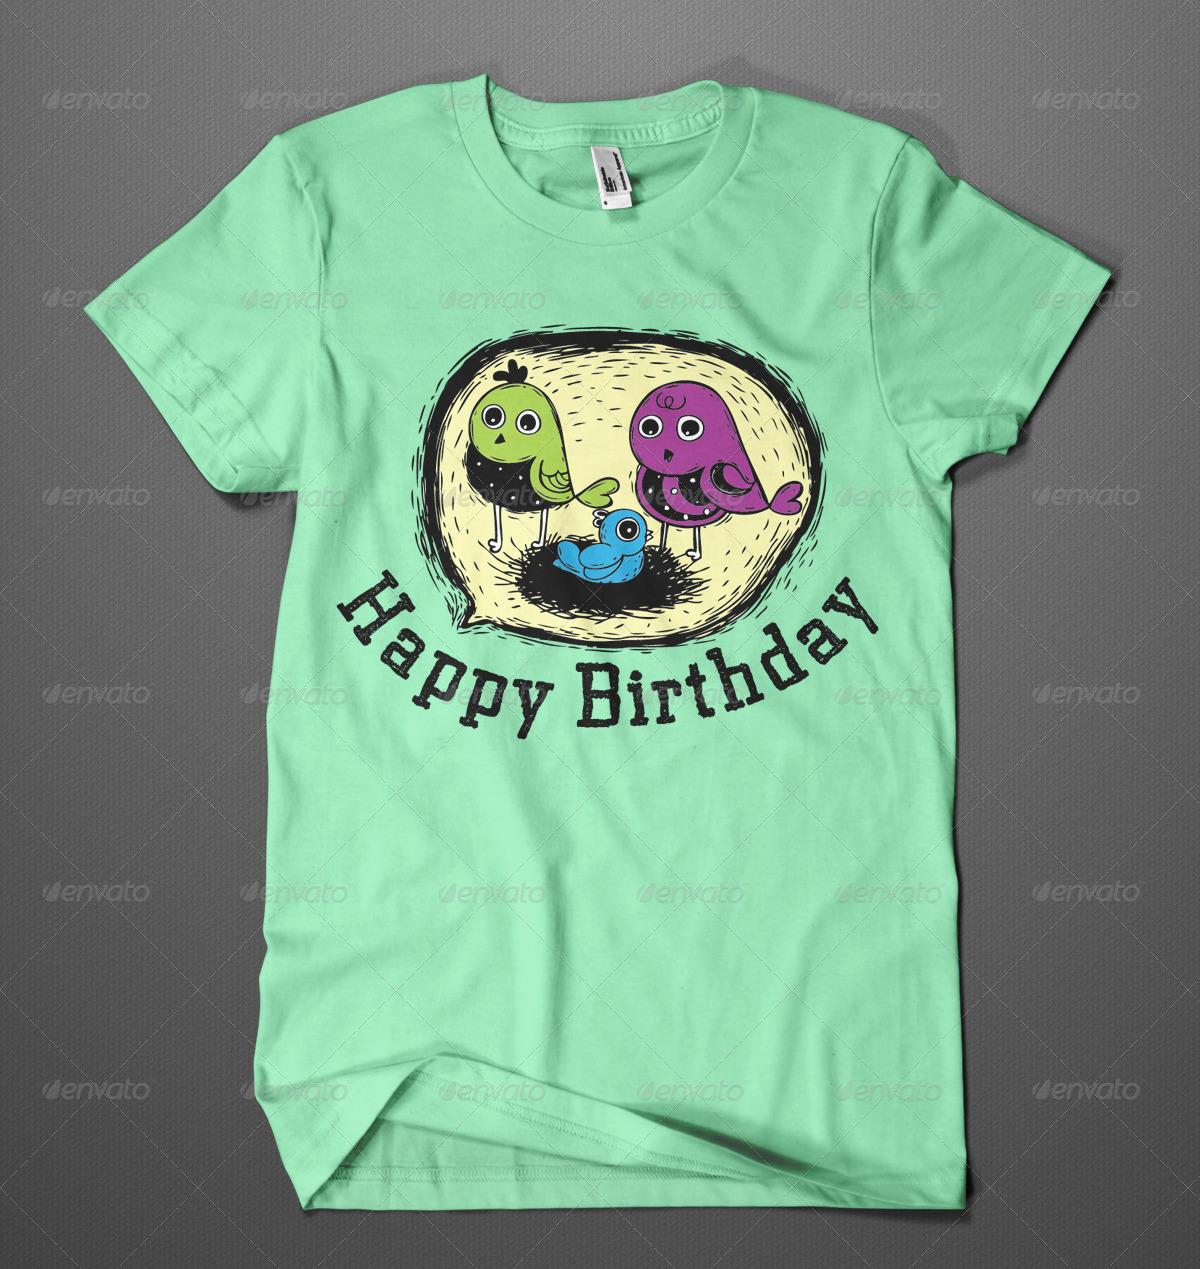 Happy Birthday T Shirt Design